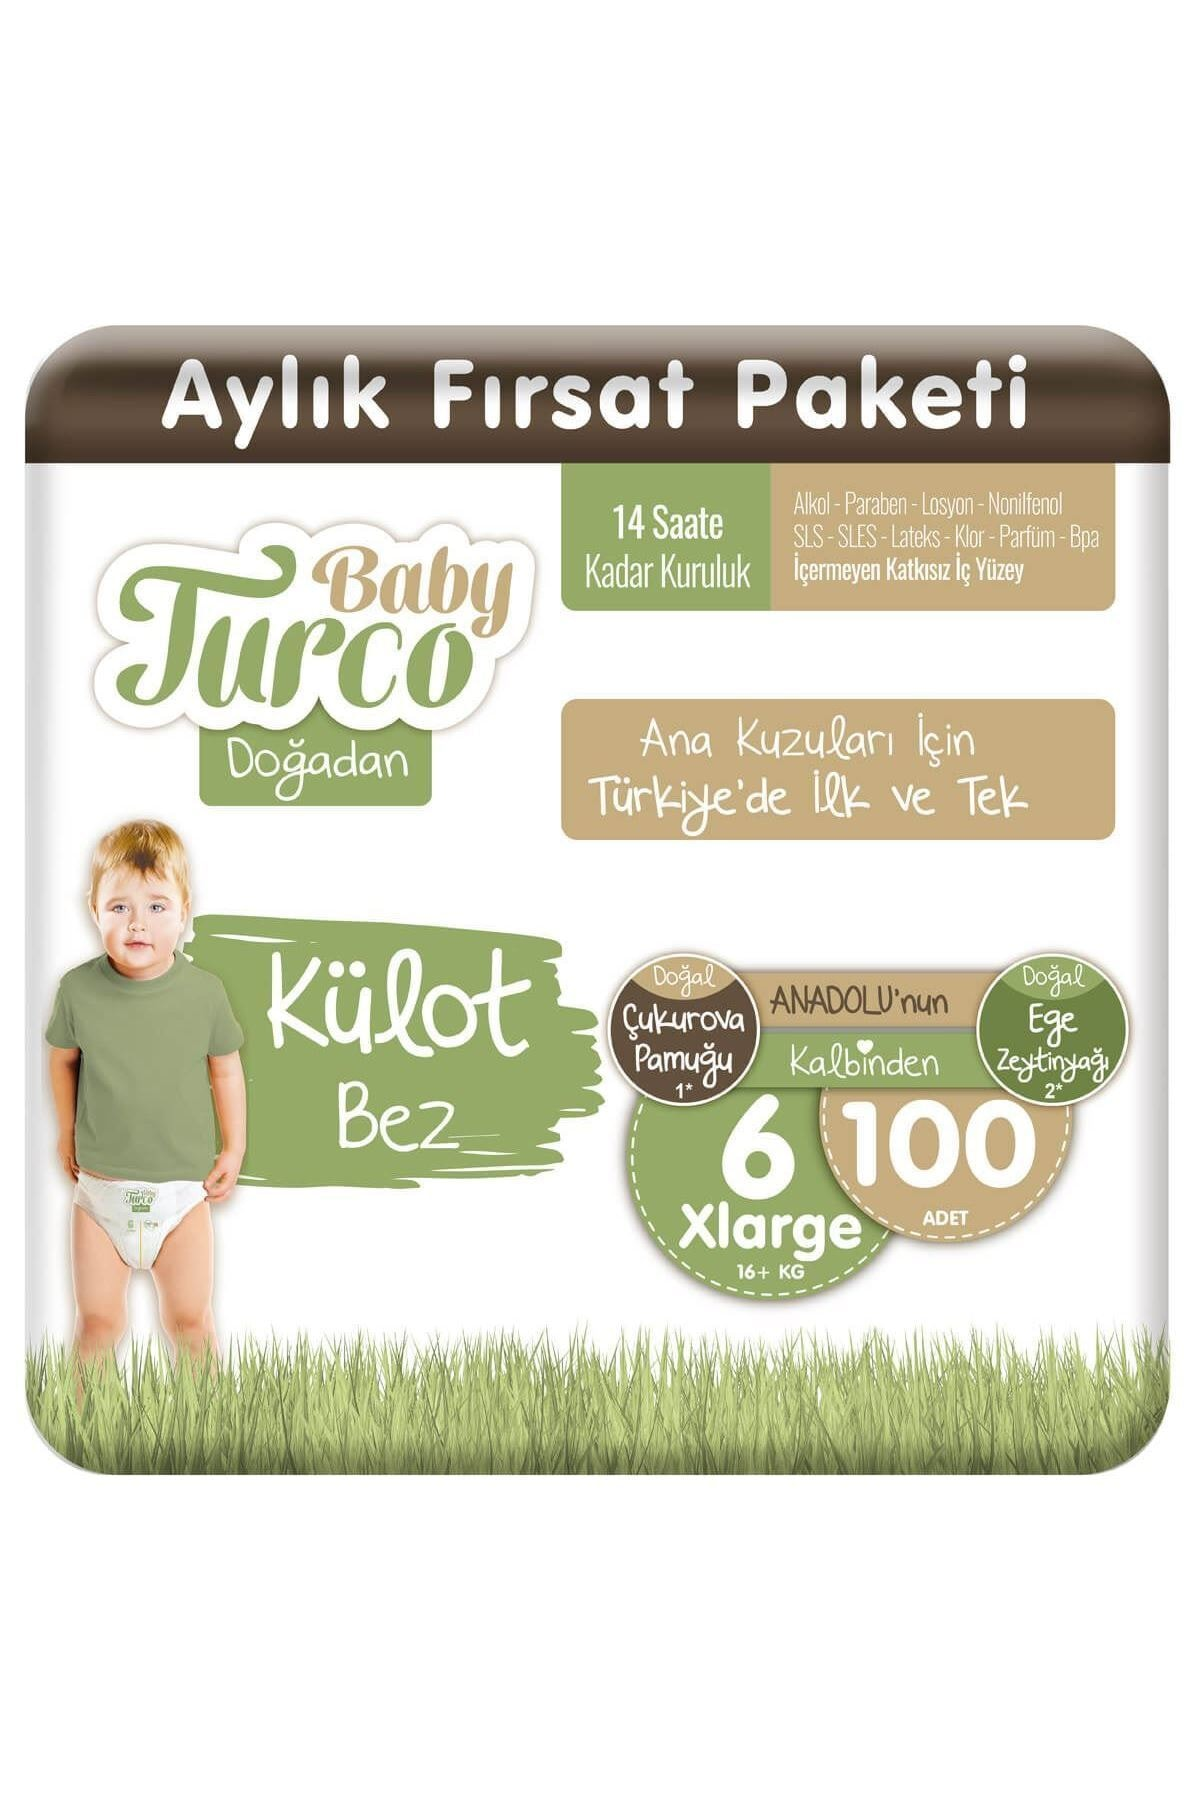 Baby Turco Doğadan Külot Bez 6 Numara Xlarge 100 Adet 1